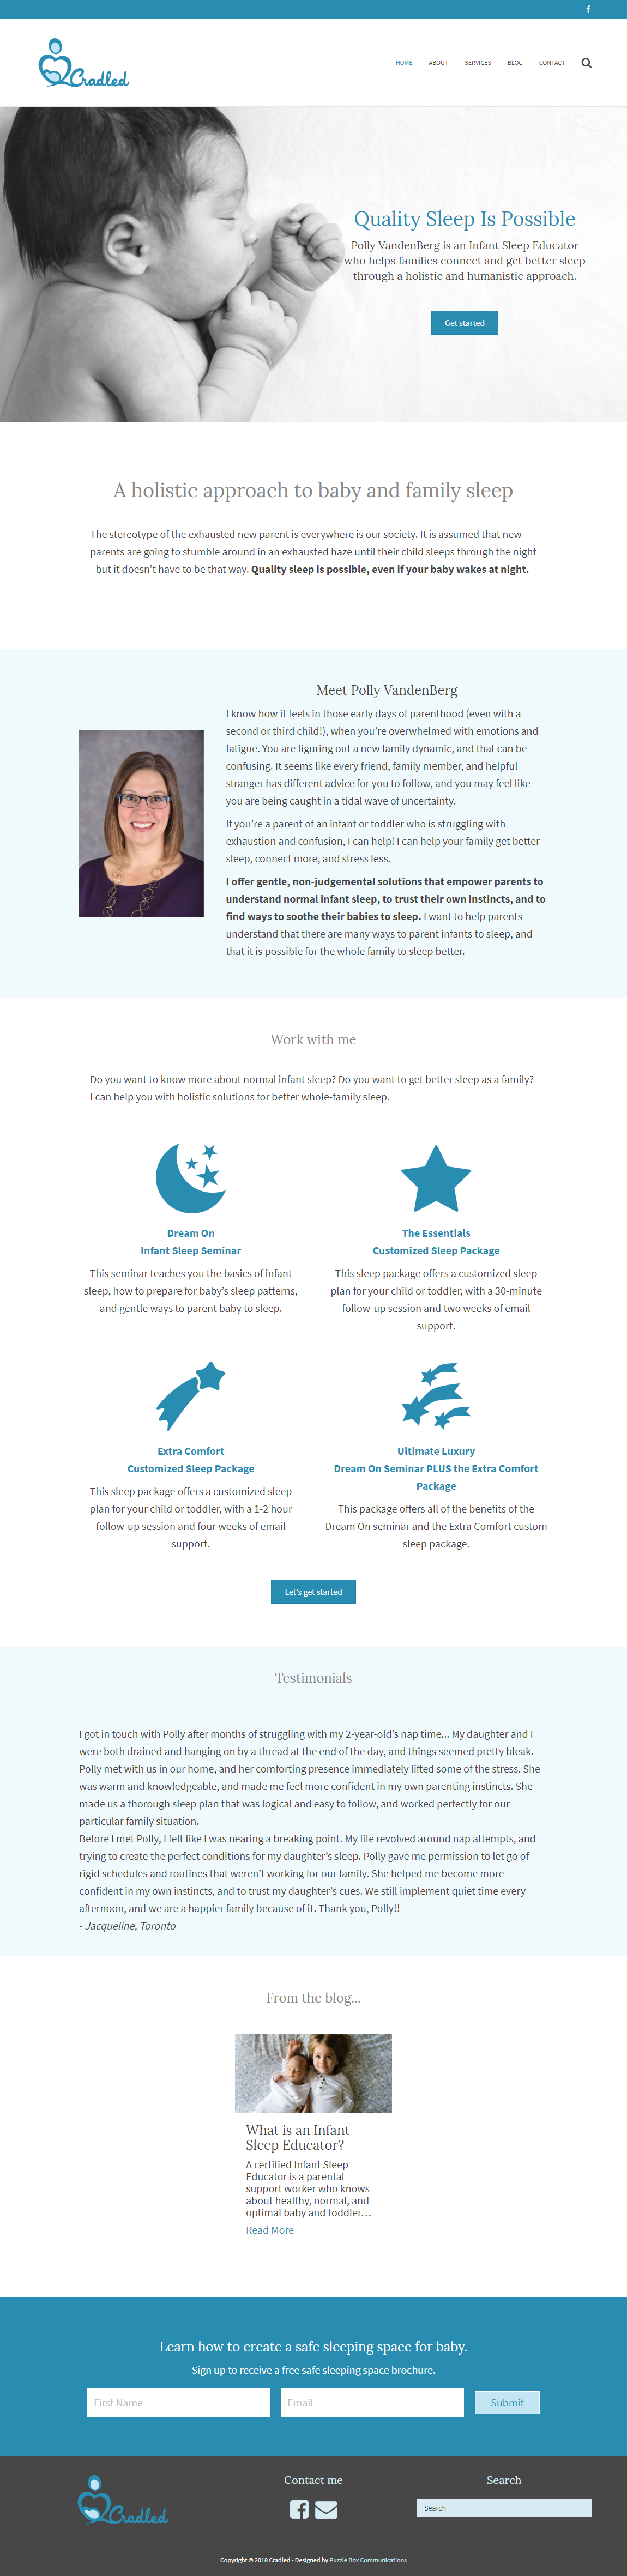 Cradled.ca, WordPress web design and development